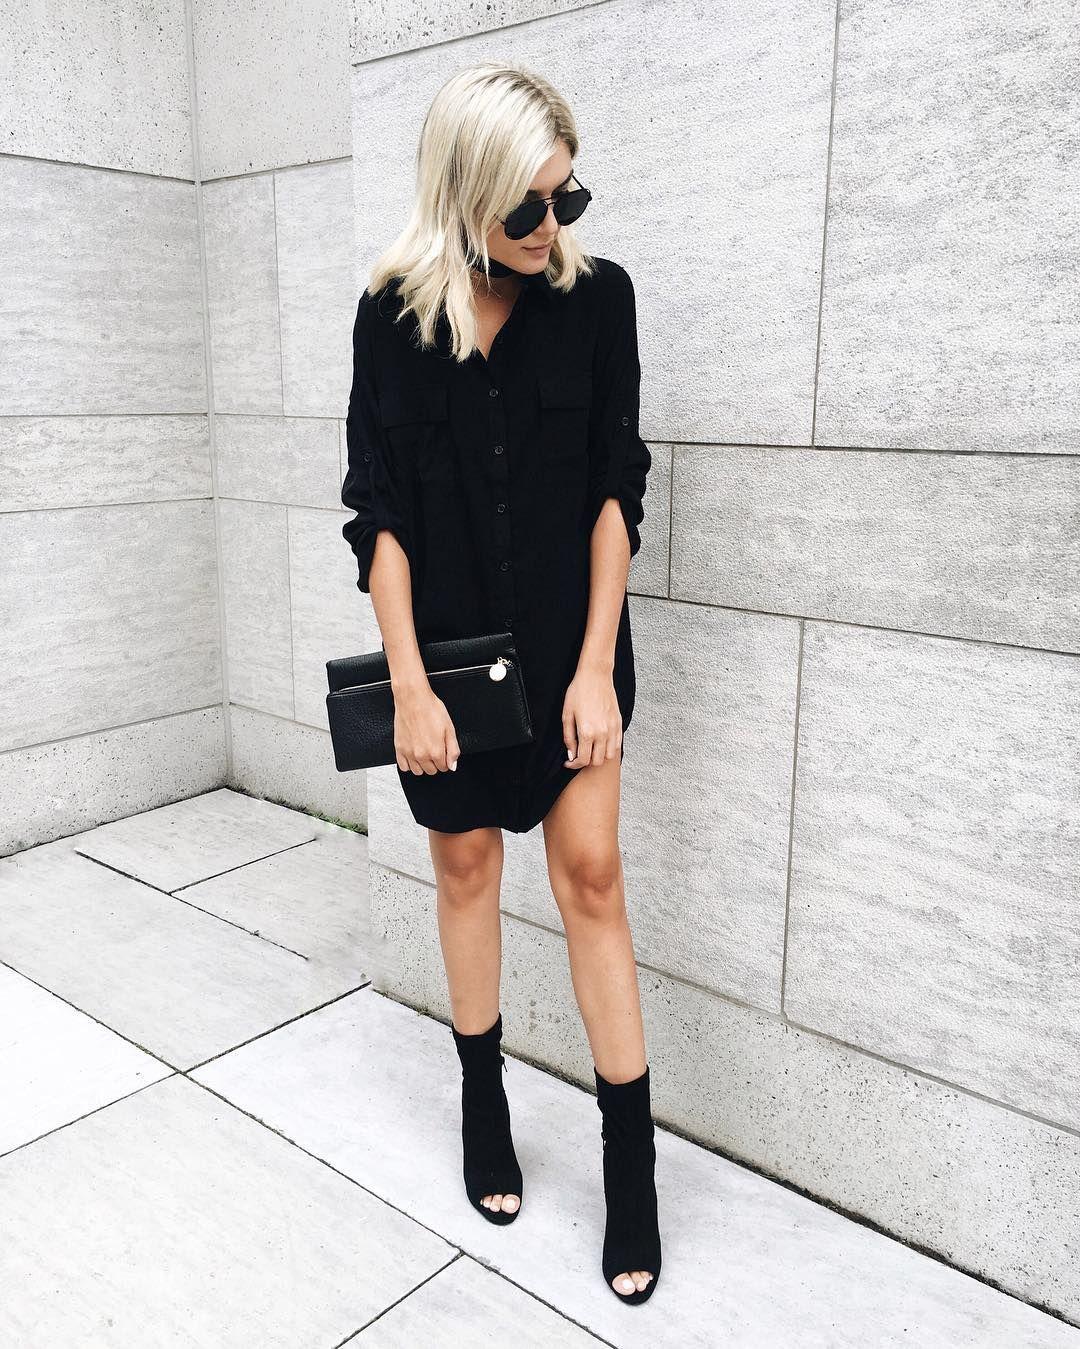 style blogger | content creator | London snapchat ...